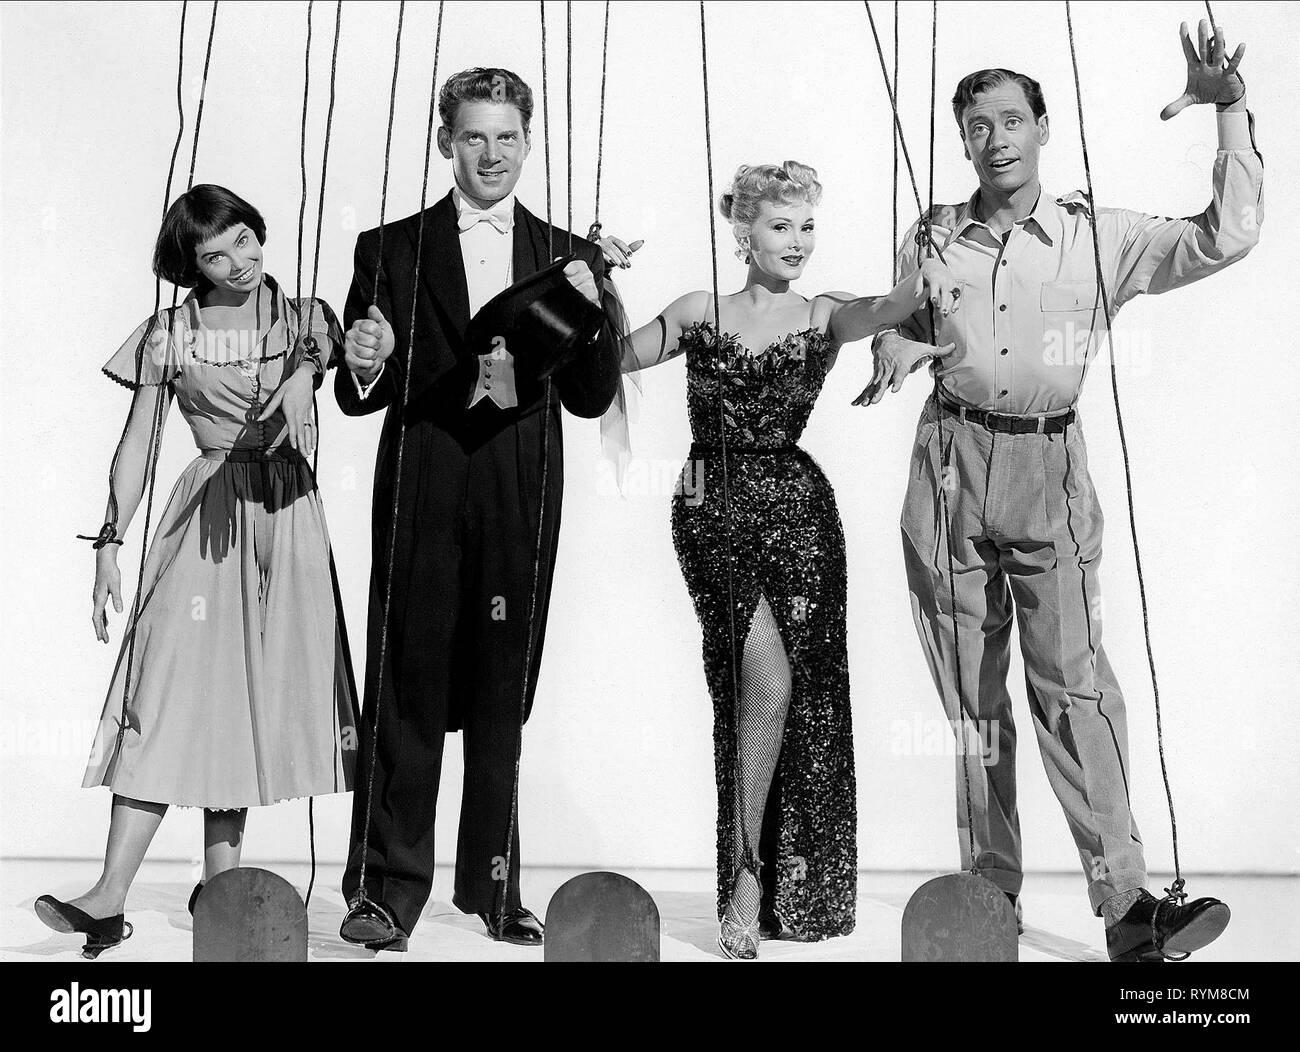 CARON,AUMONT,GABOR,FERRER, LILI, 1953 - Stock Image